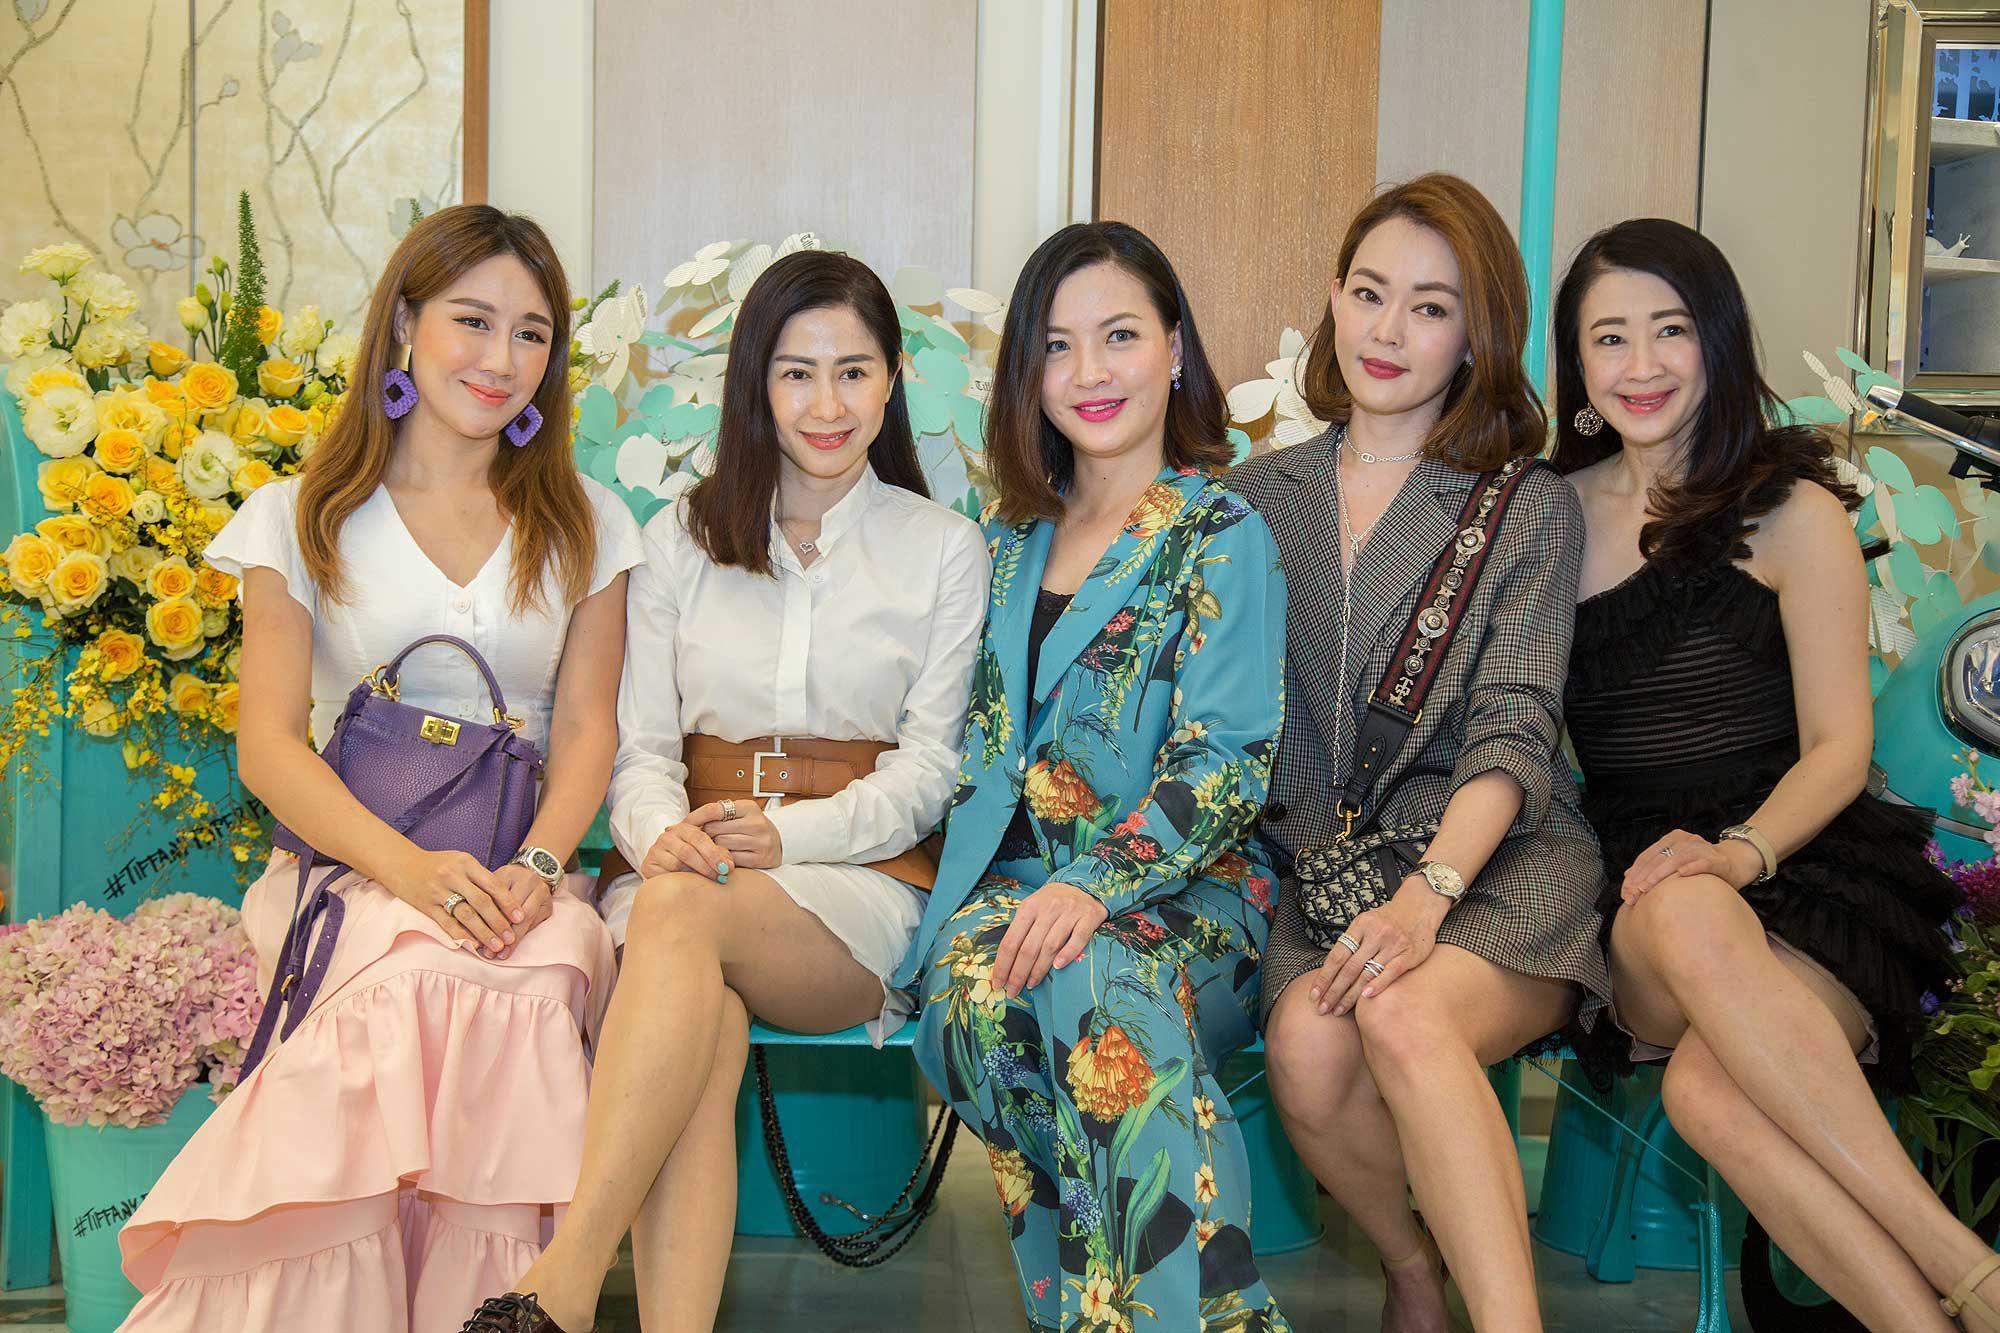 Olivia Lau, Datin Kim Isabelle, Cherrie Chin, Elaine Chan and Christine Cheah